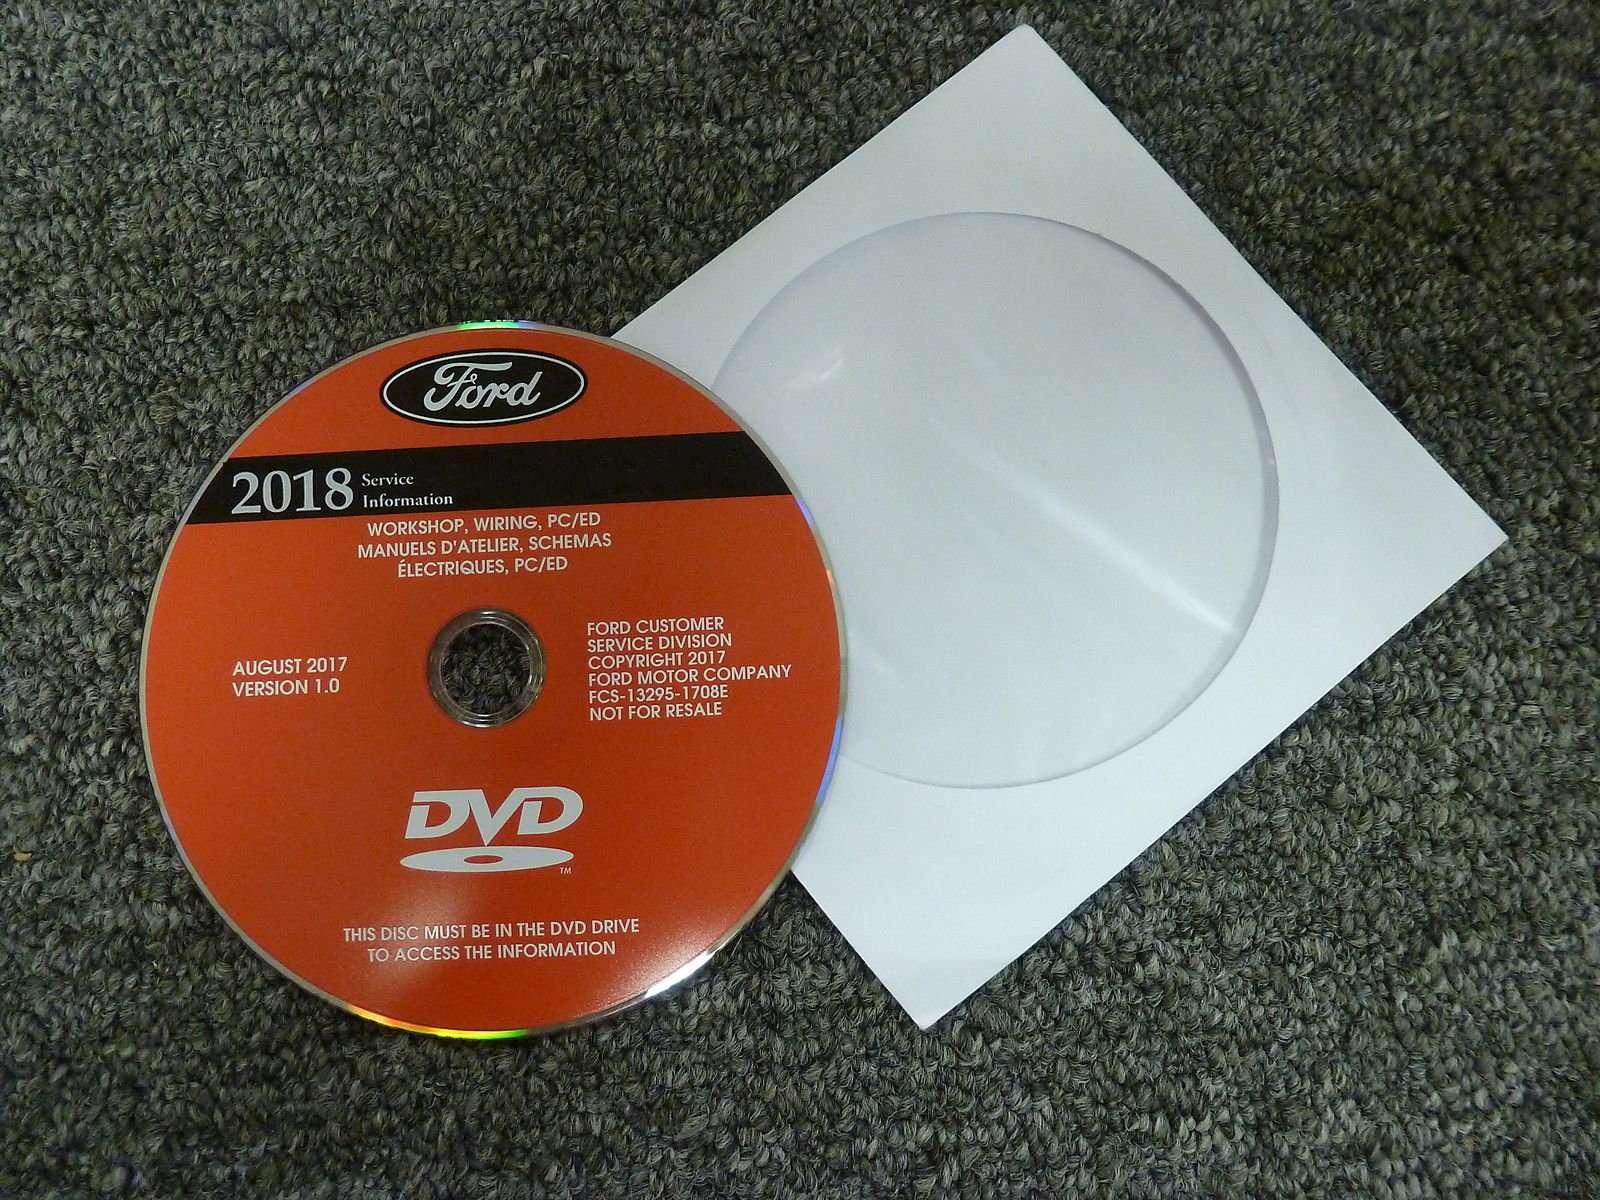 2018 Ford Edge Service Manual Dvd